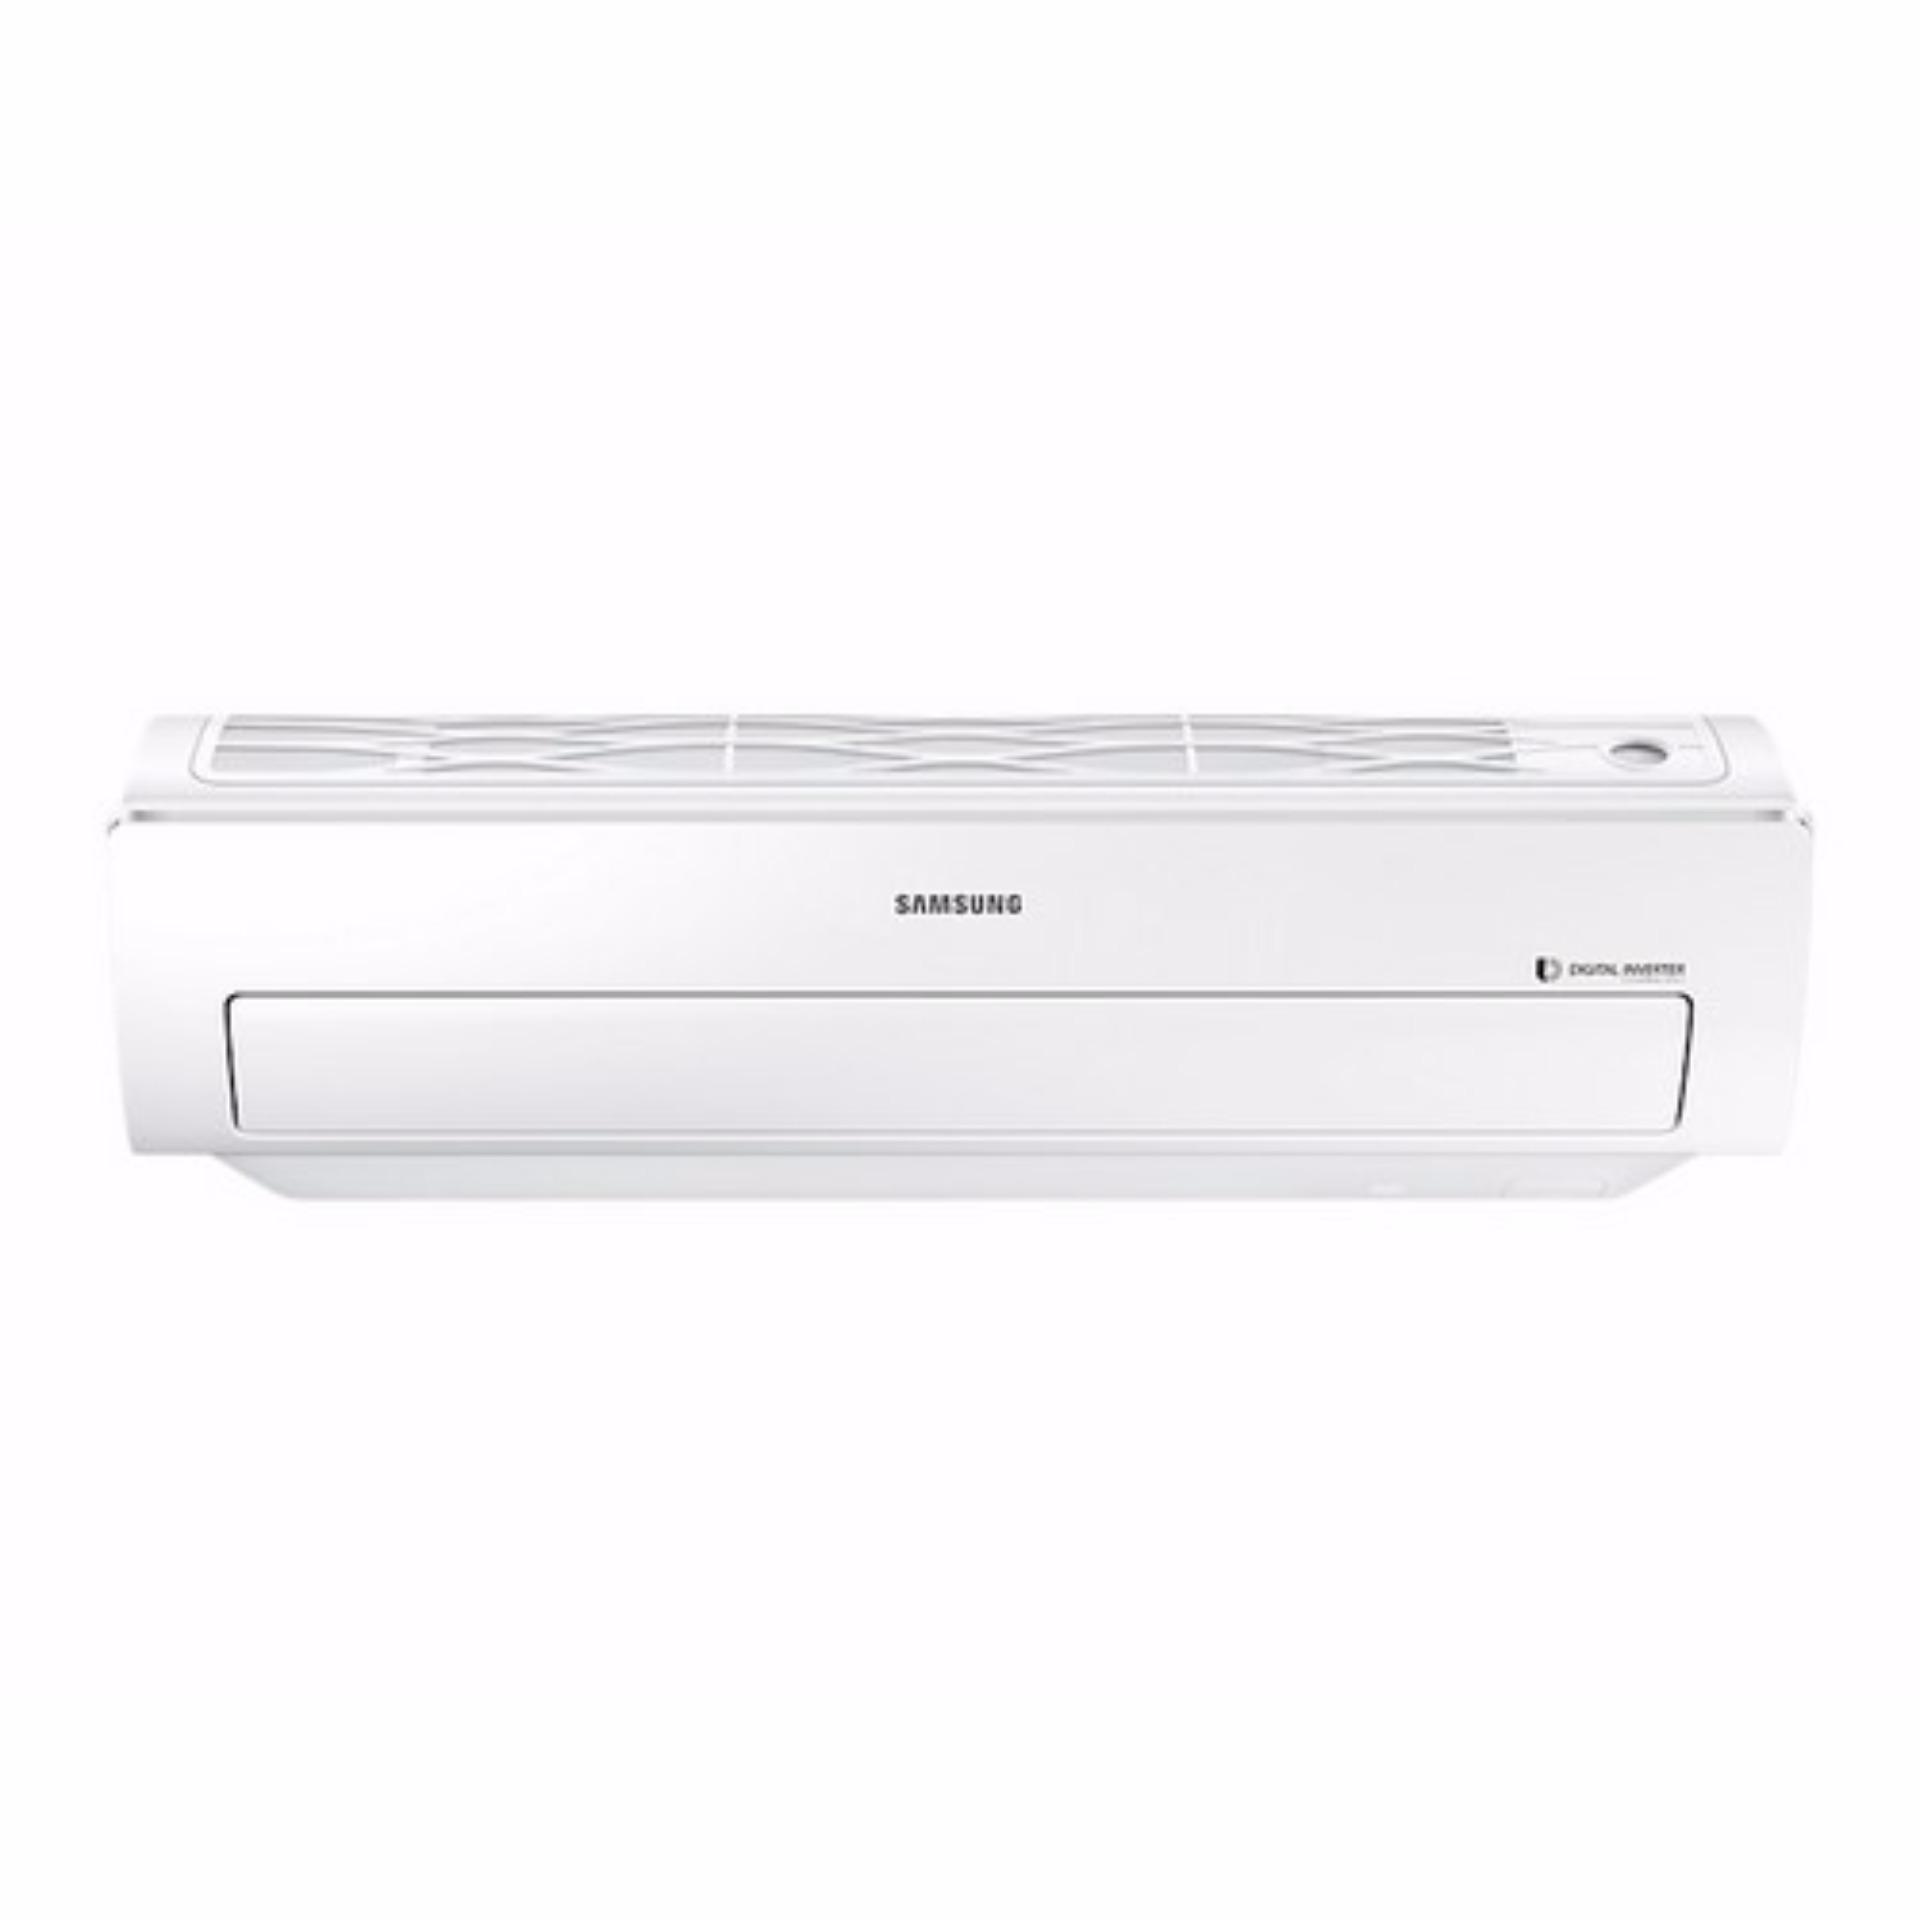 Máy lạnh Samsung Inverter 1.5 HP AR13MVFSBWKNSV